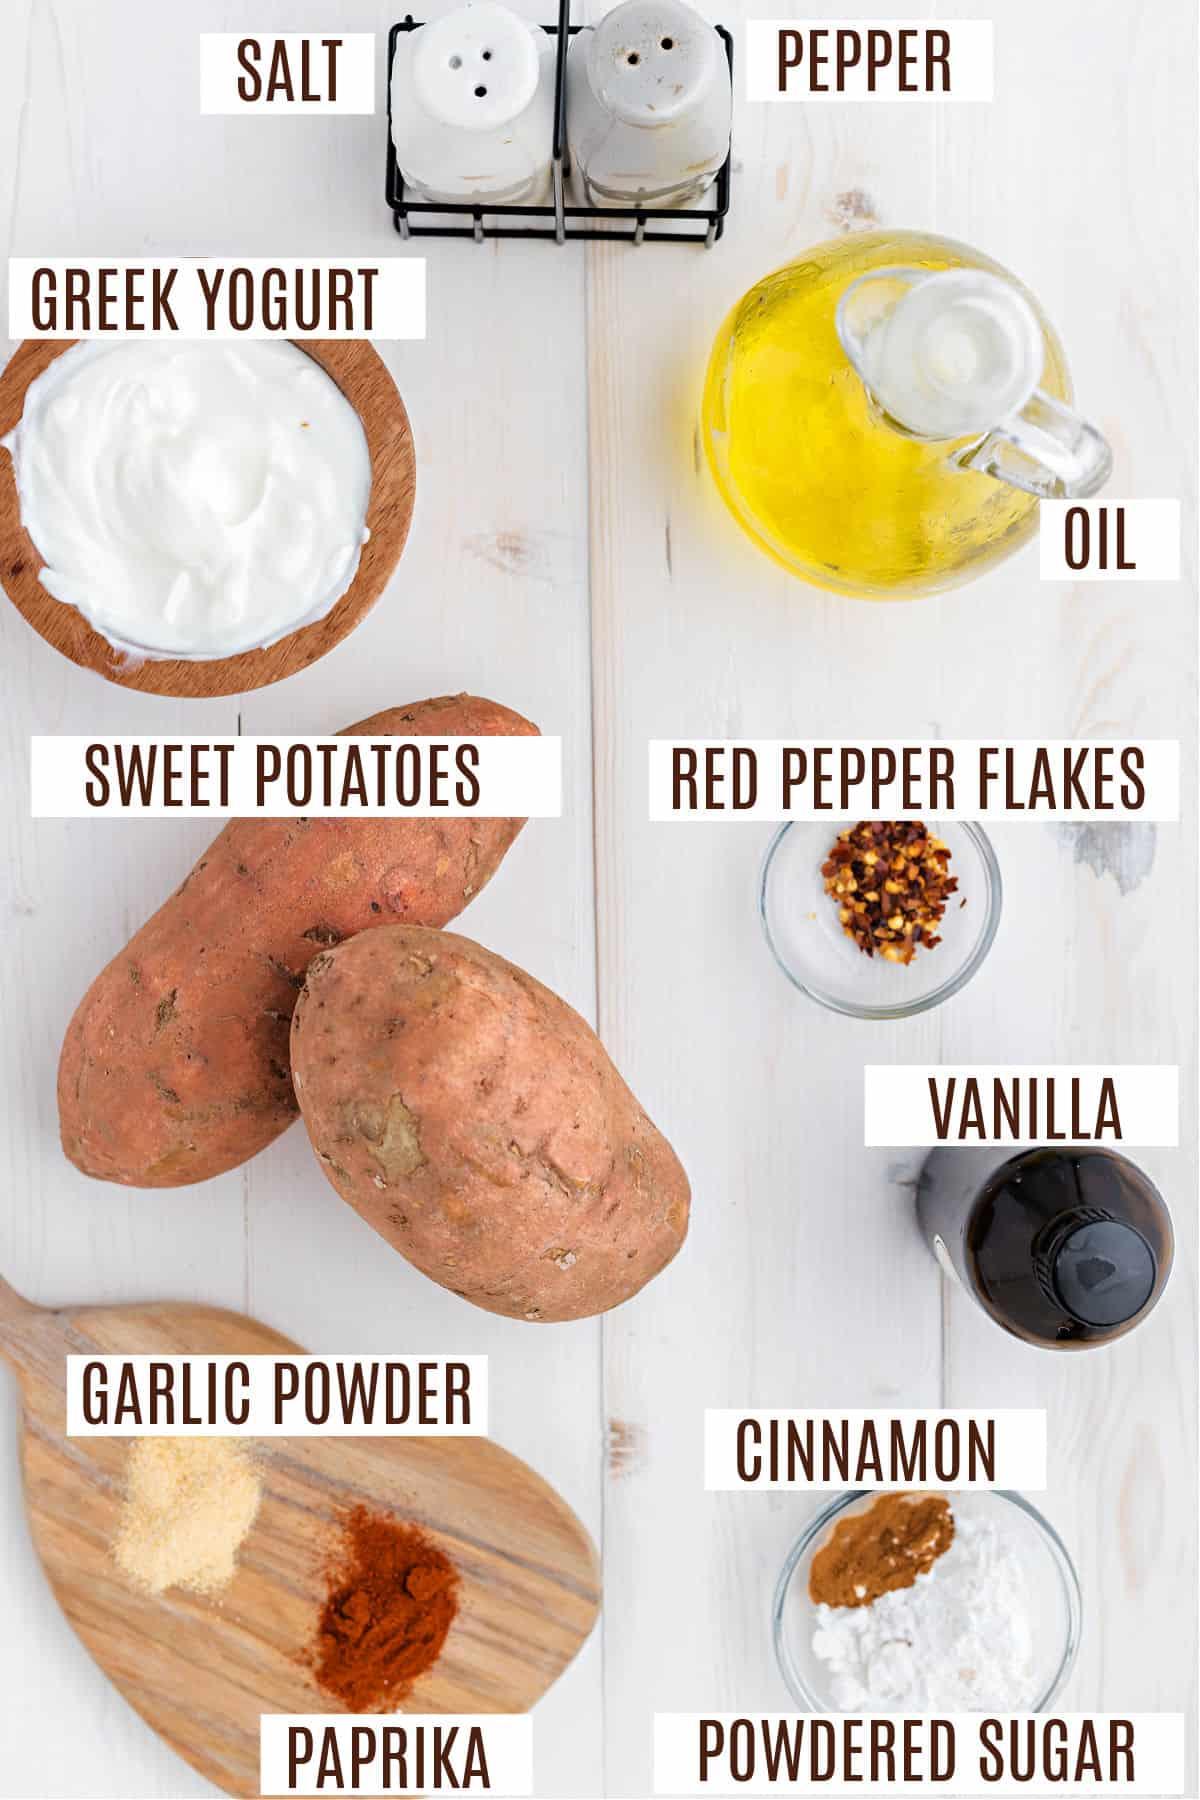 Ingredients needed to make homemade sweet potato fries.